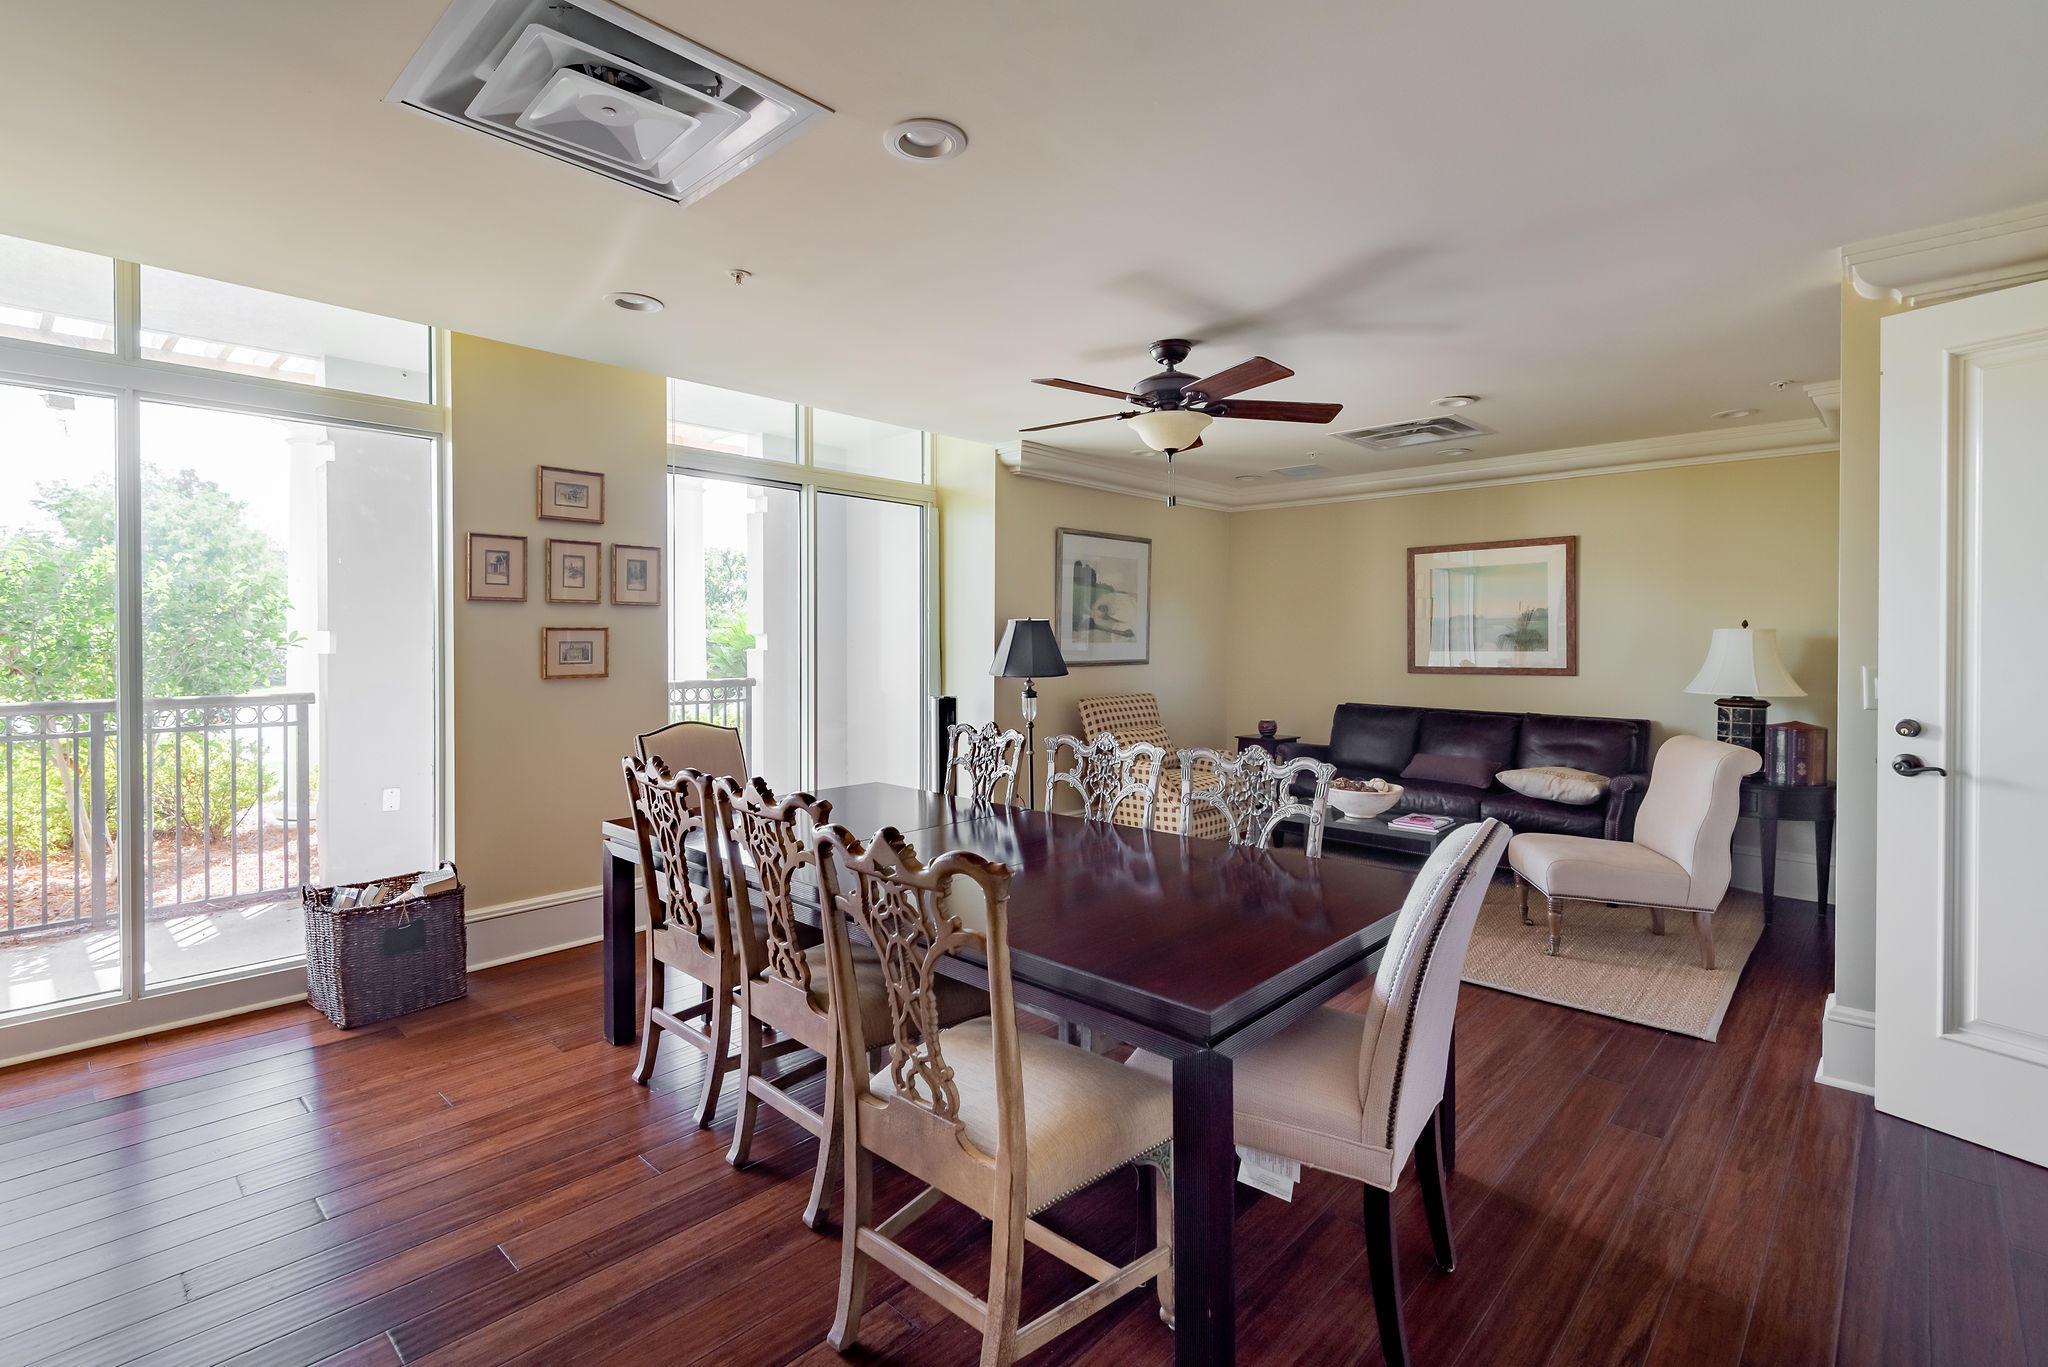 Renaissance On Chas Harbor Homes For Sale - 211 Plaza, Mount Pleasant, SC - 29